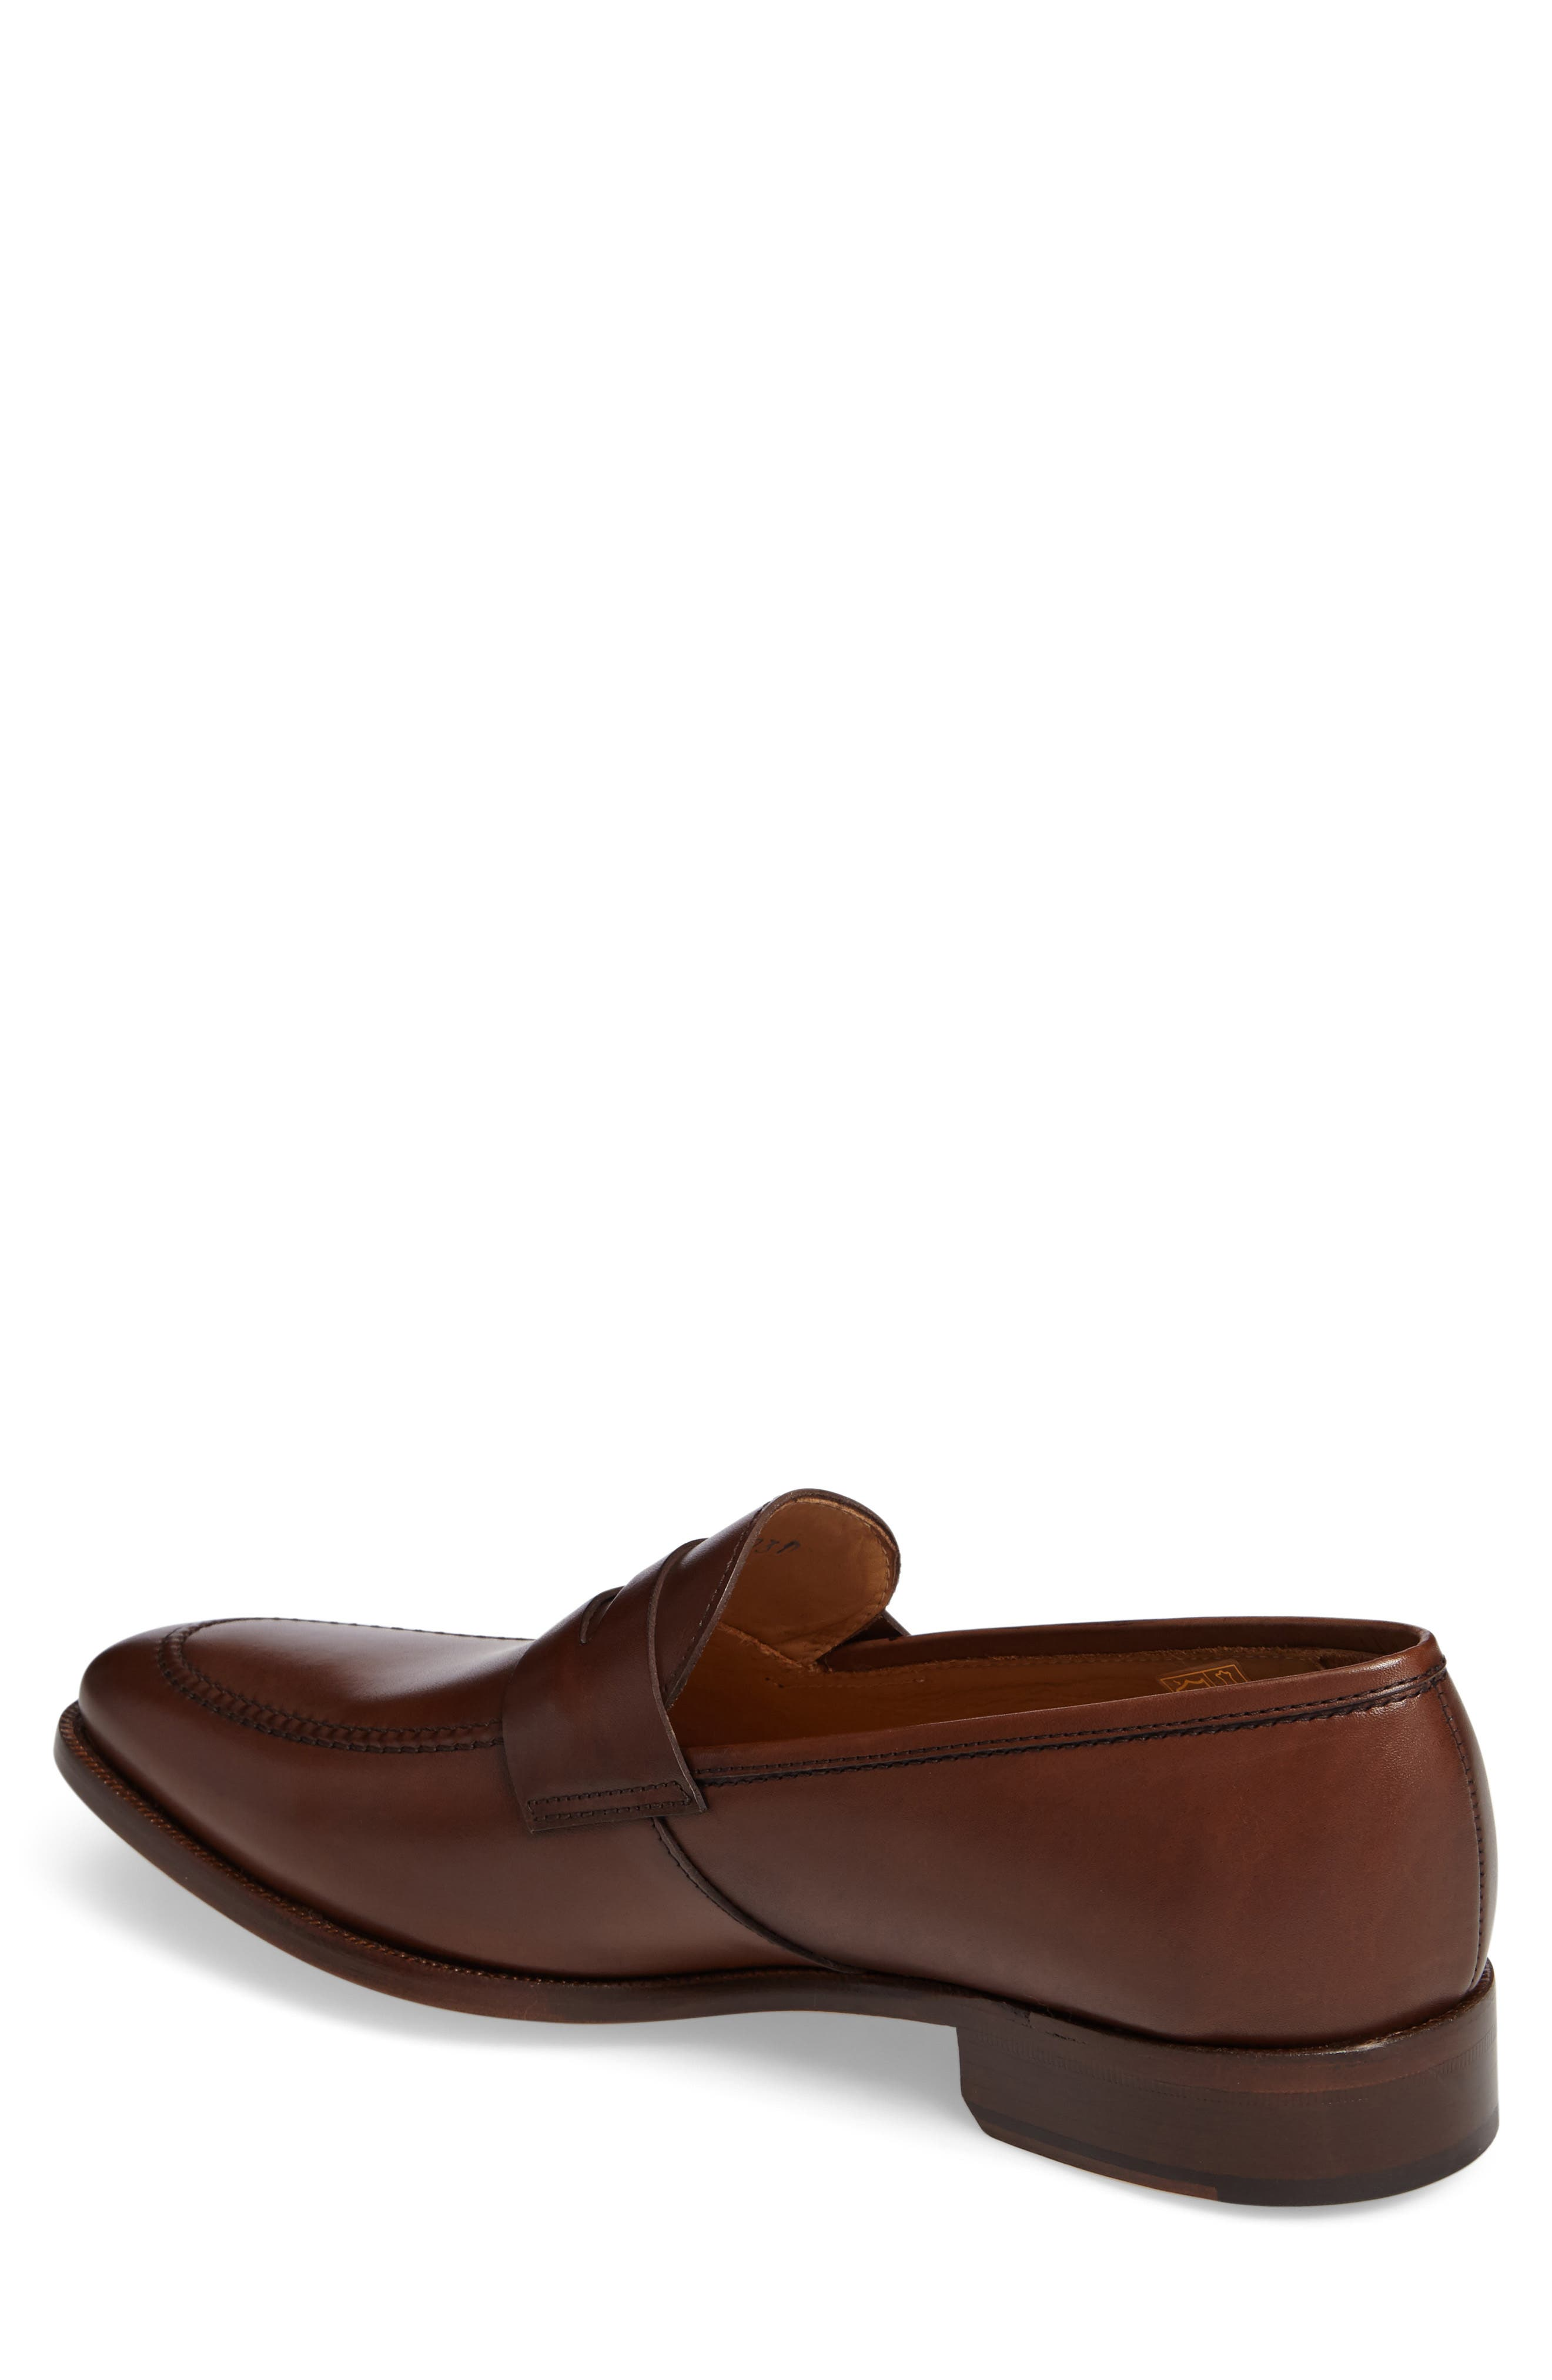 Abe Penny Loafer,                             Alternate thumbnail 2, color,                             Hazelnut Leather